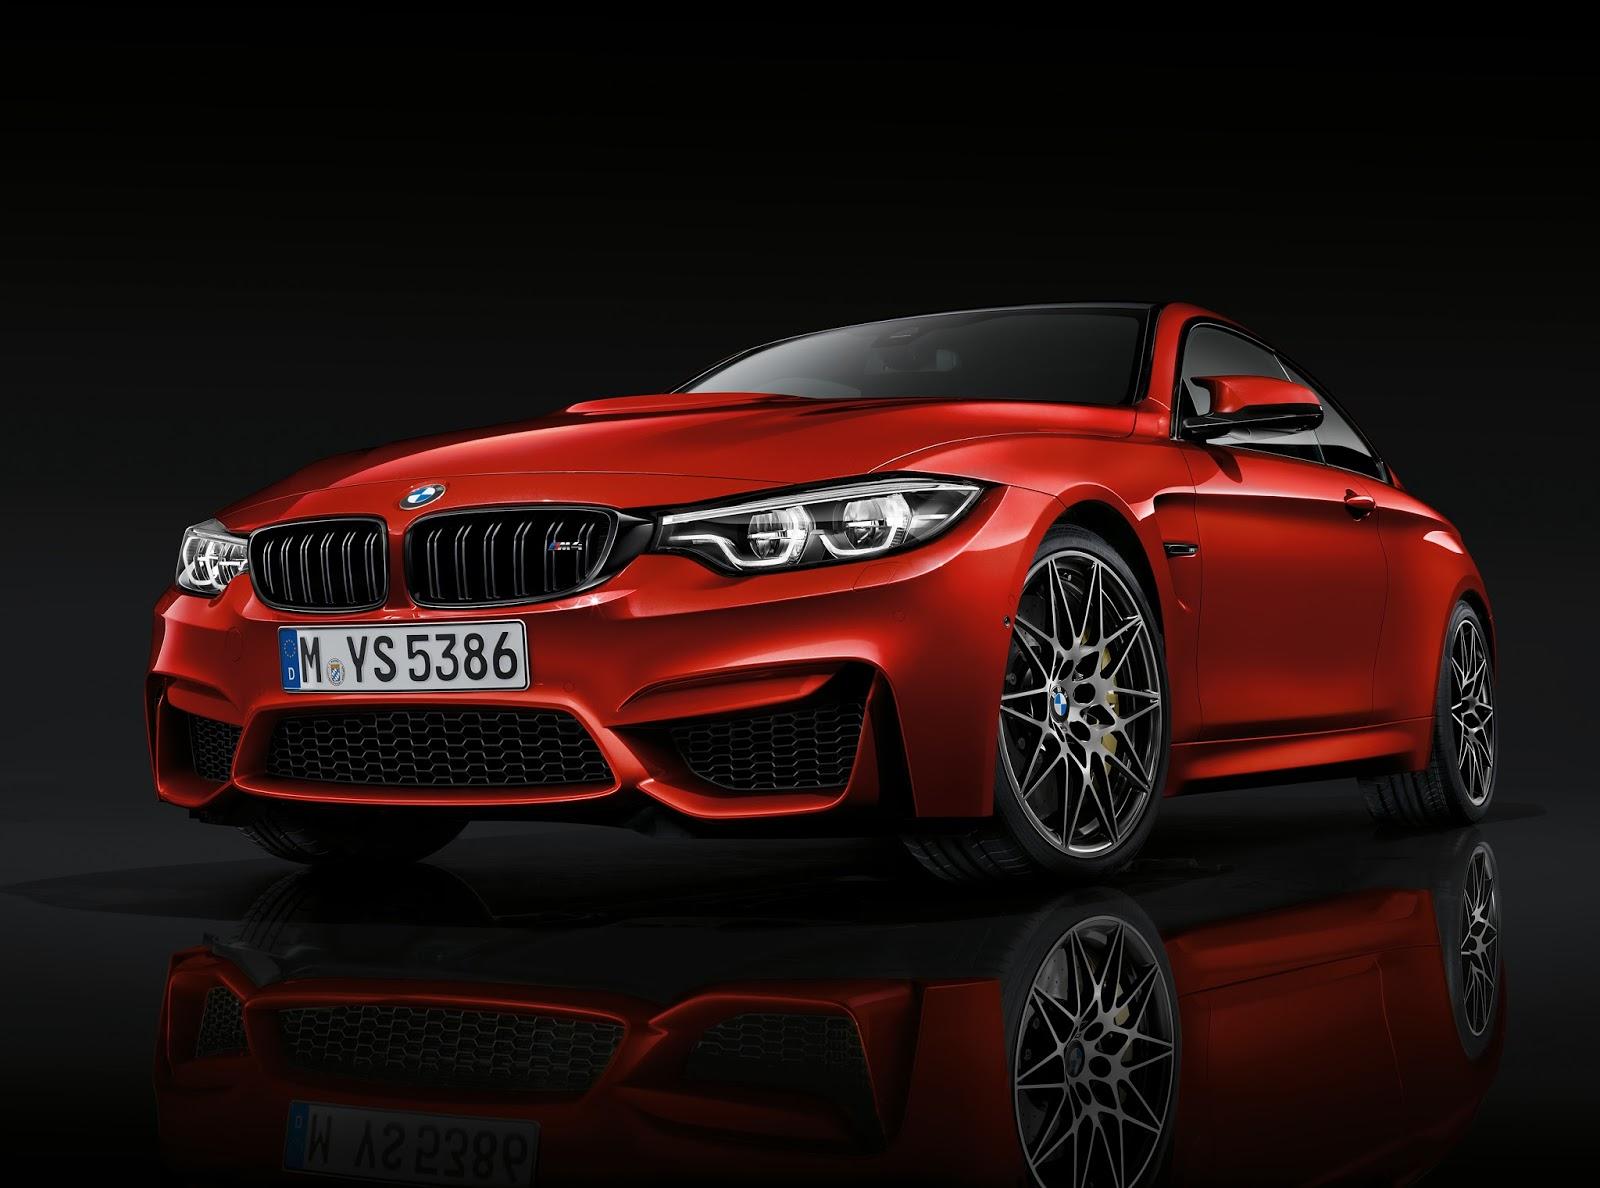 P90244955 highRes bmw m4 coup 01 2017 Η νέα BMW Σειρά 4, με πιο σφιχτή ρύθμιση ανάρτησης BMW, Bmw 4, BMW 4 Cabrio, BMW 4 Coupe, BMW 4 Gran Coupé, Facelift